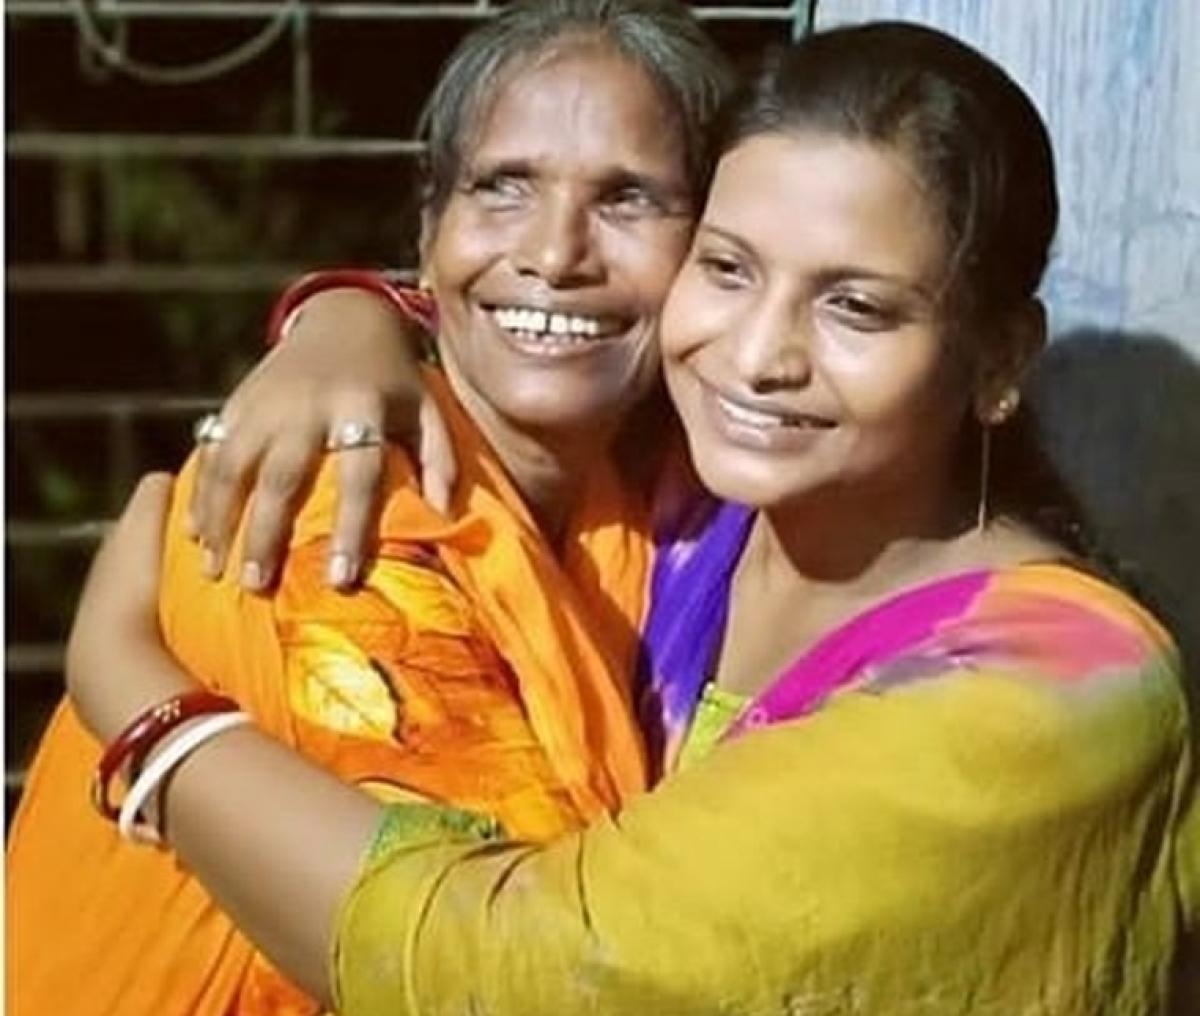 Viral singer Ranu Mondal reunites with daughter after recording song with Himesh Reshammiya